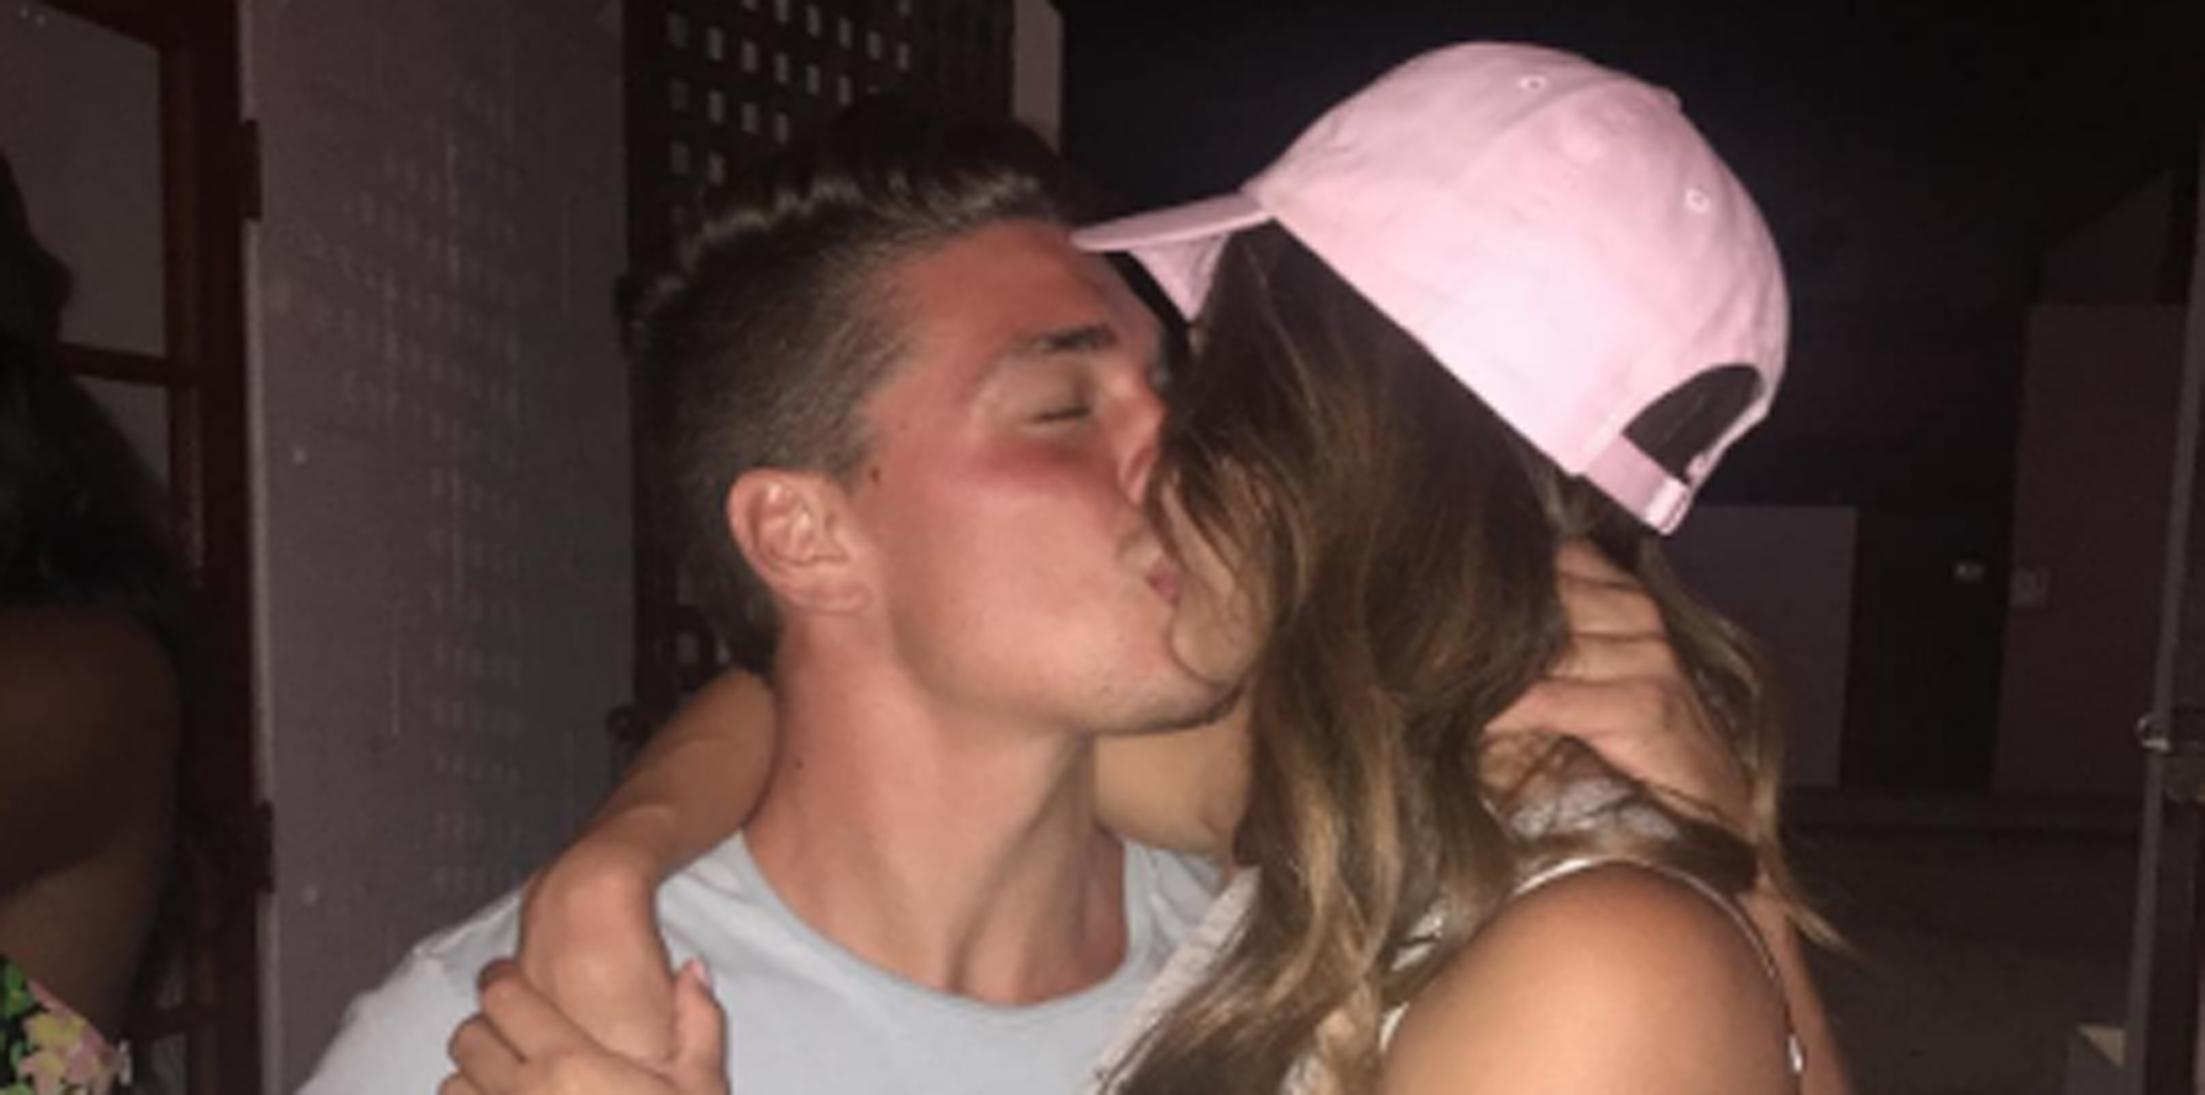 Danielle lombard reveals dean unglert encouraged break up with her on bip finale hero